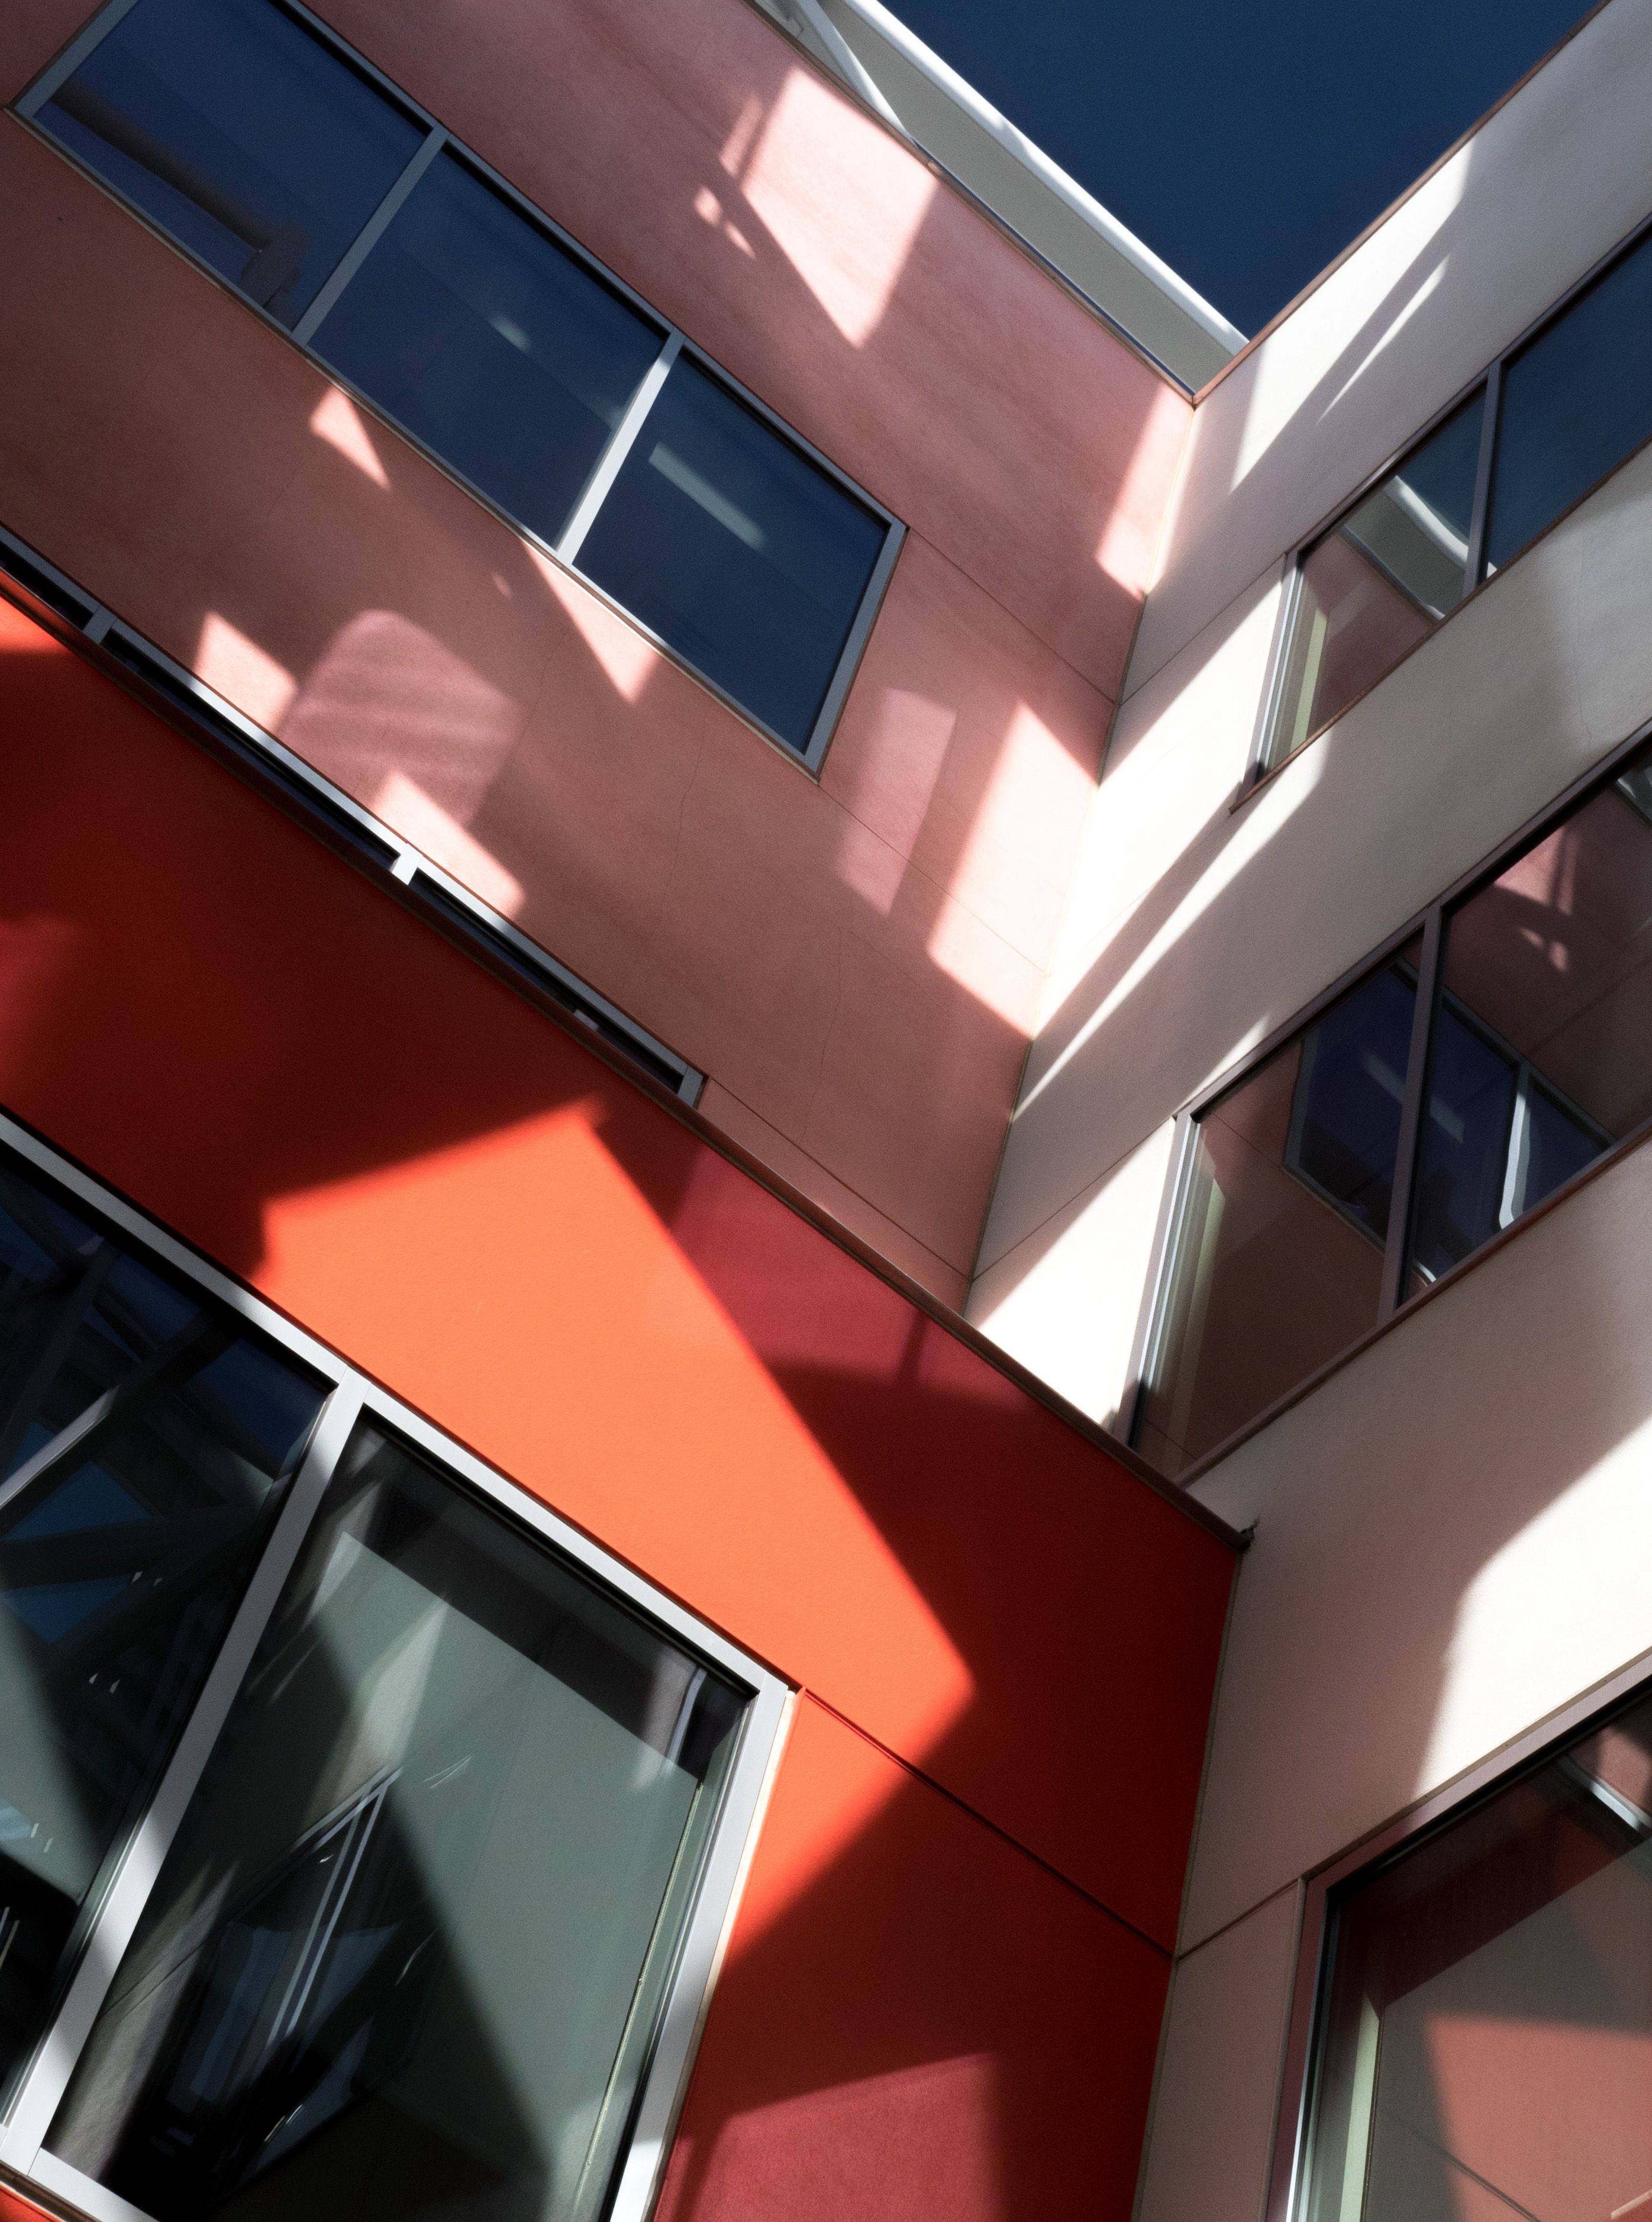 Cleveland Clinic Courtyard. I